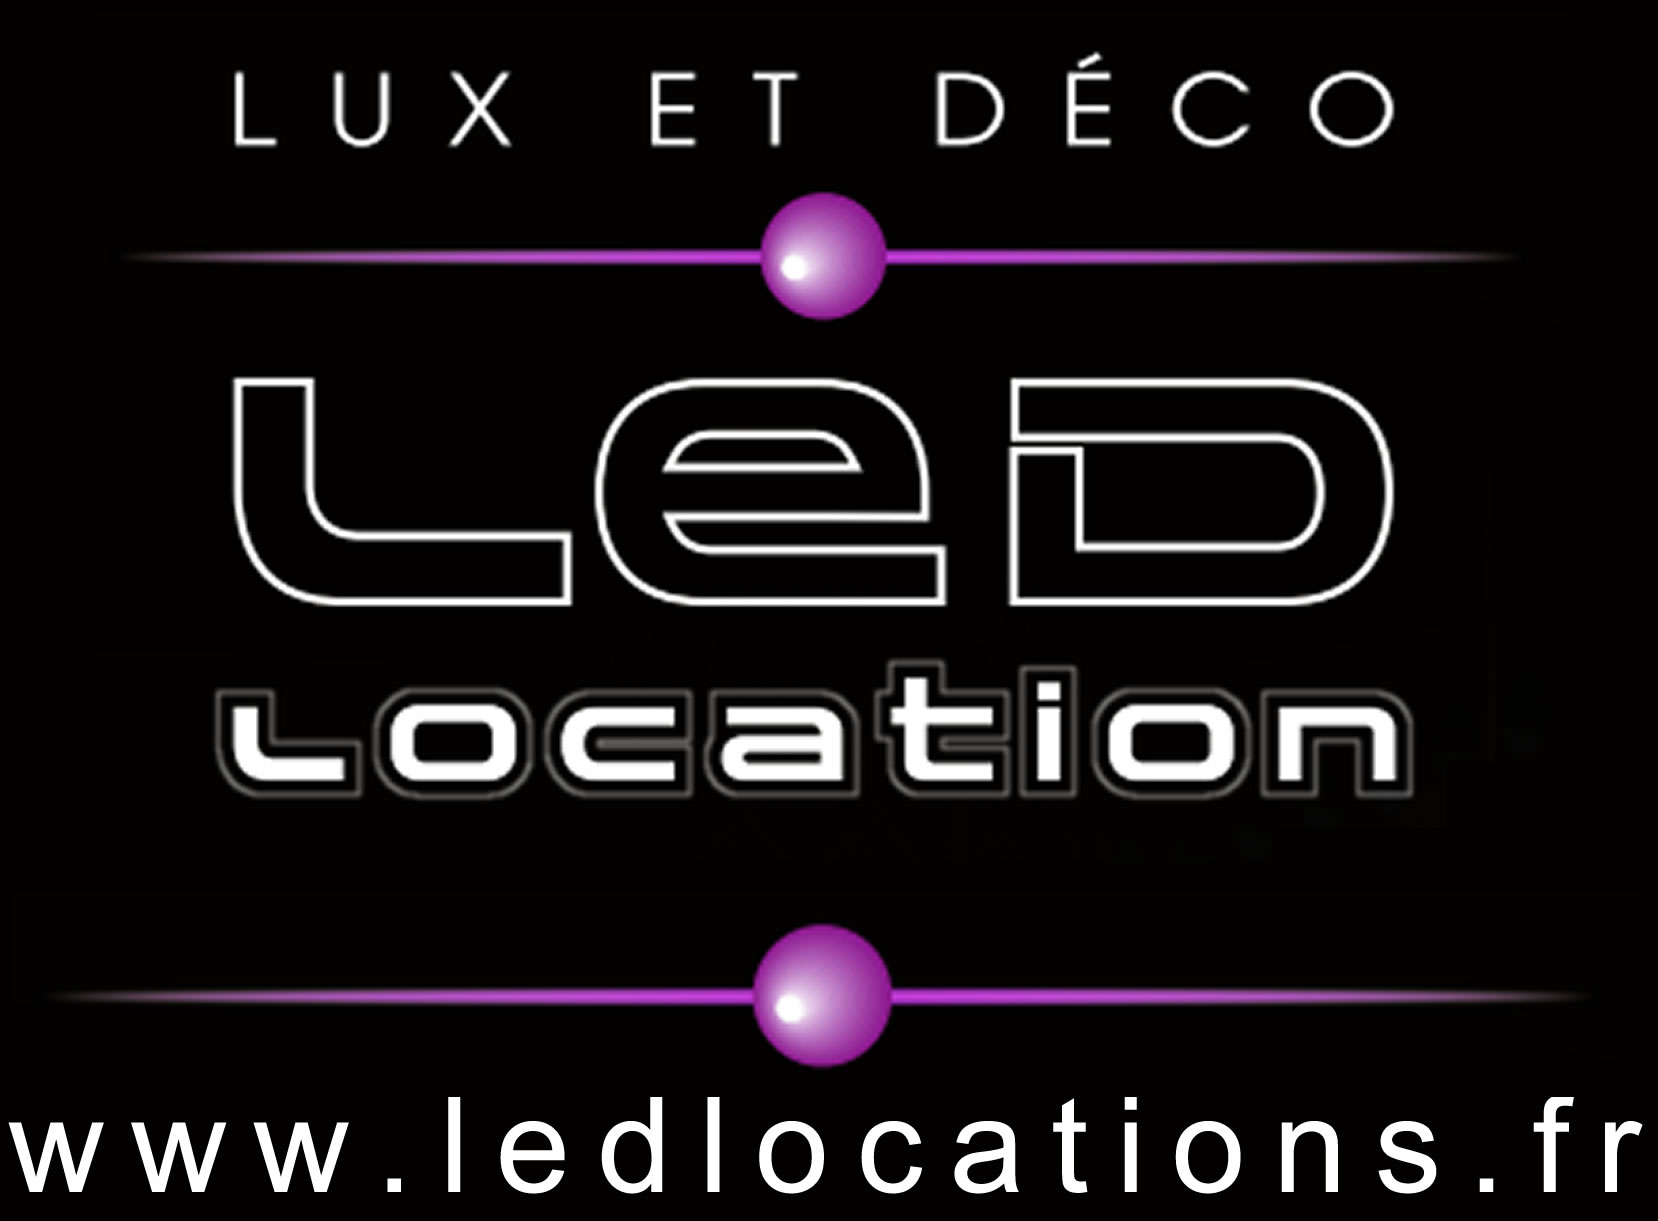 LUX ET DECO LOCATION